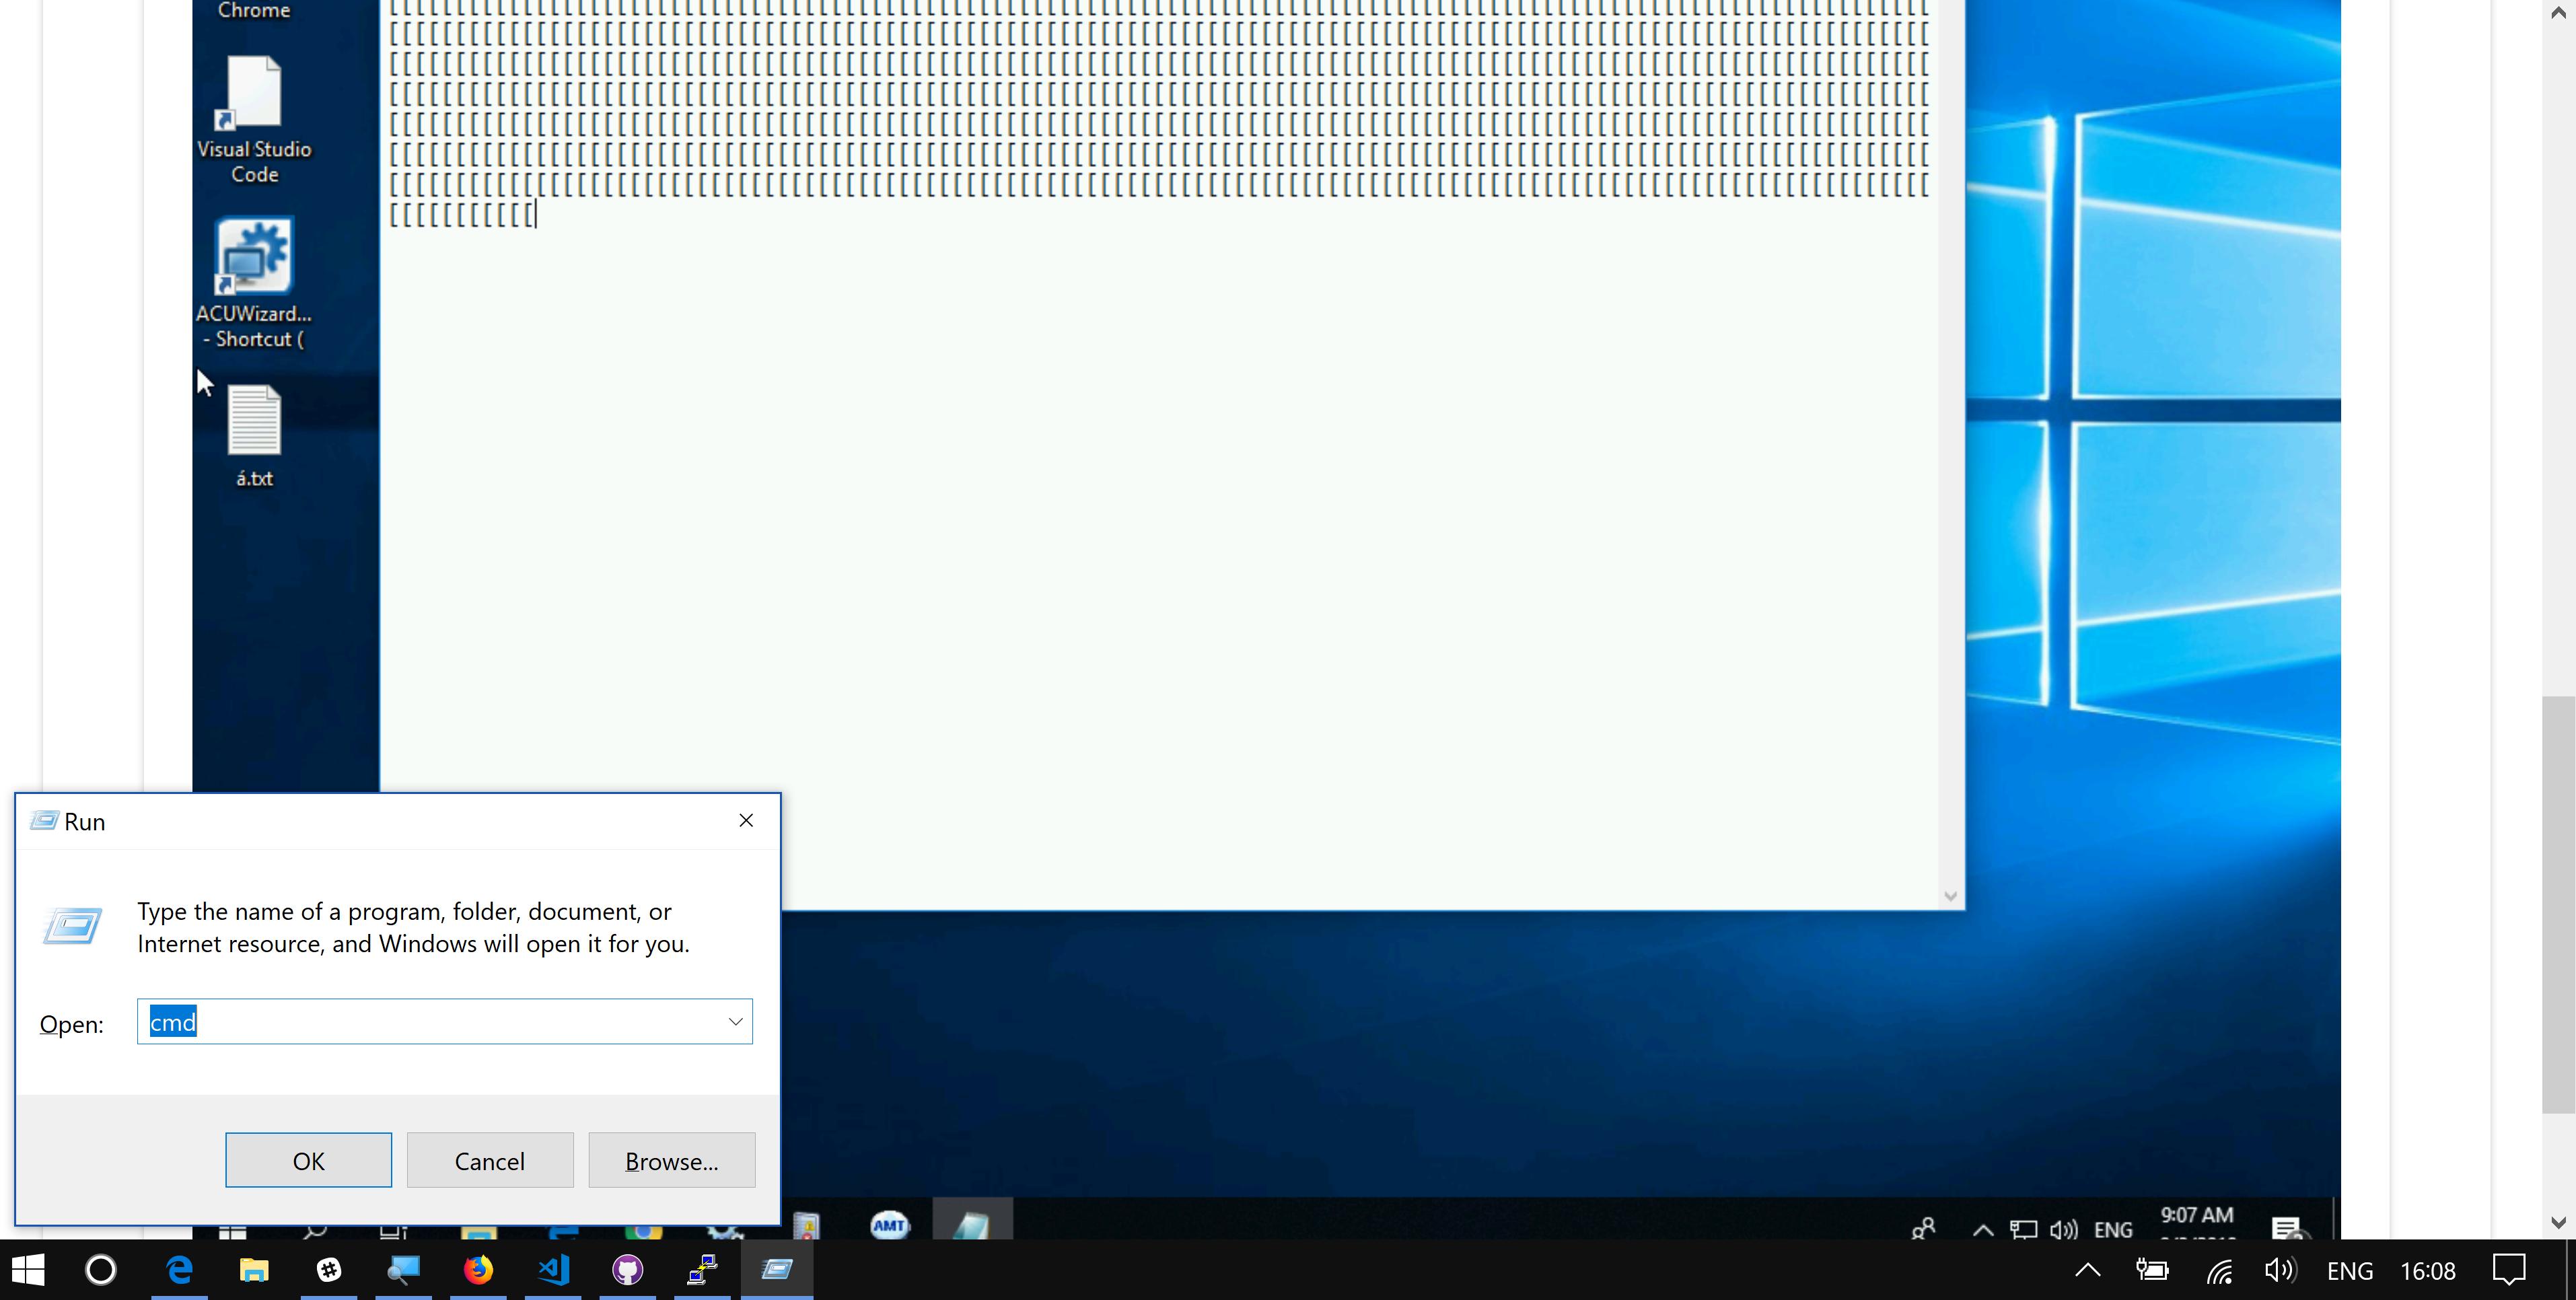 System keys are not working in remote desktop (CIRA-KVM